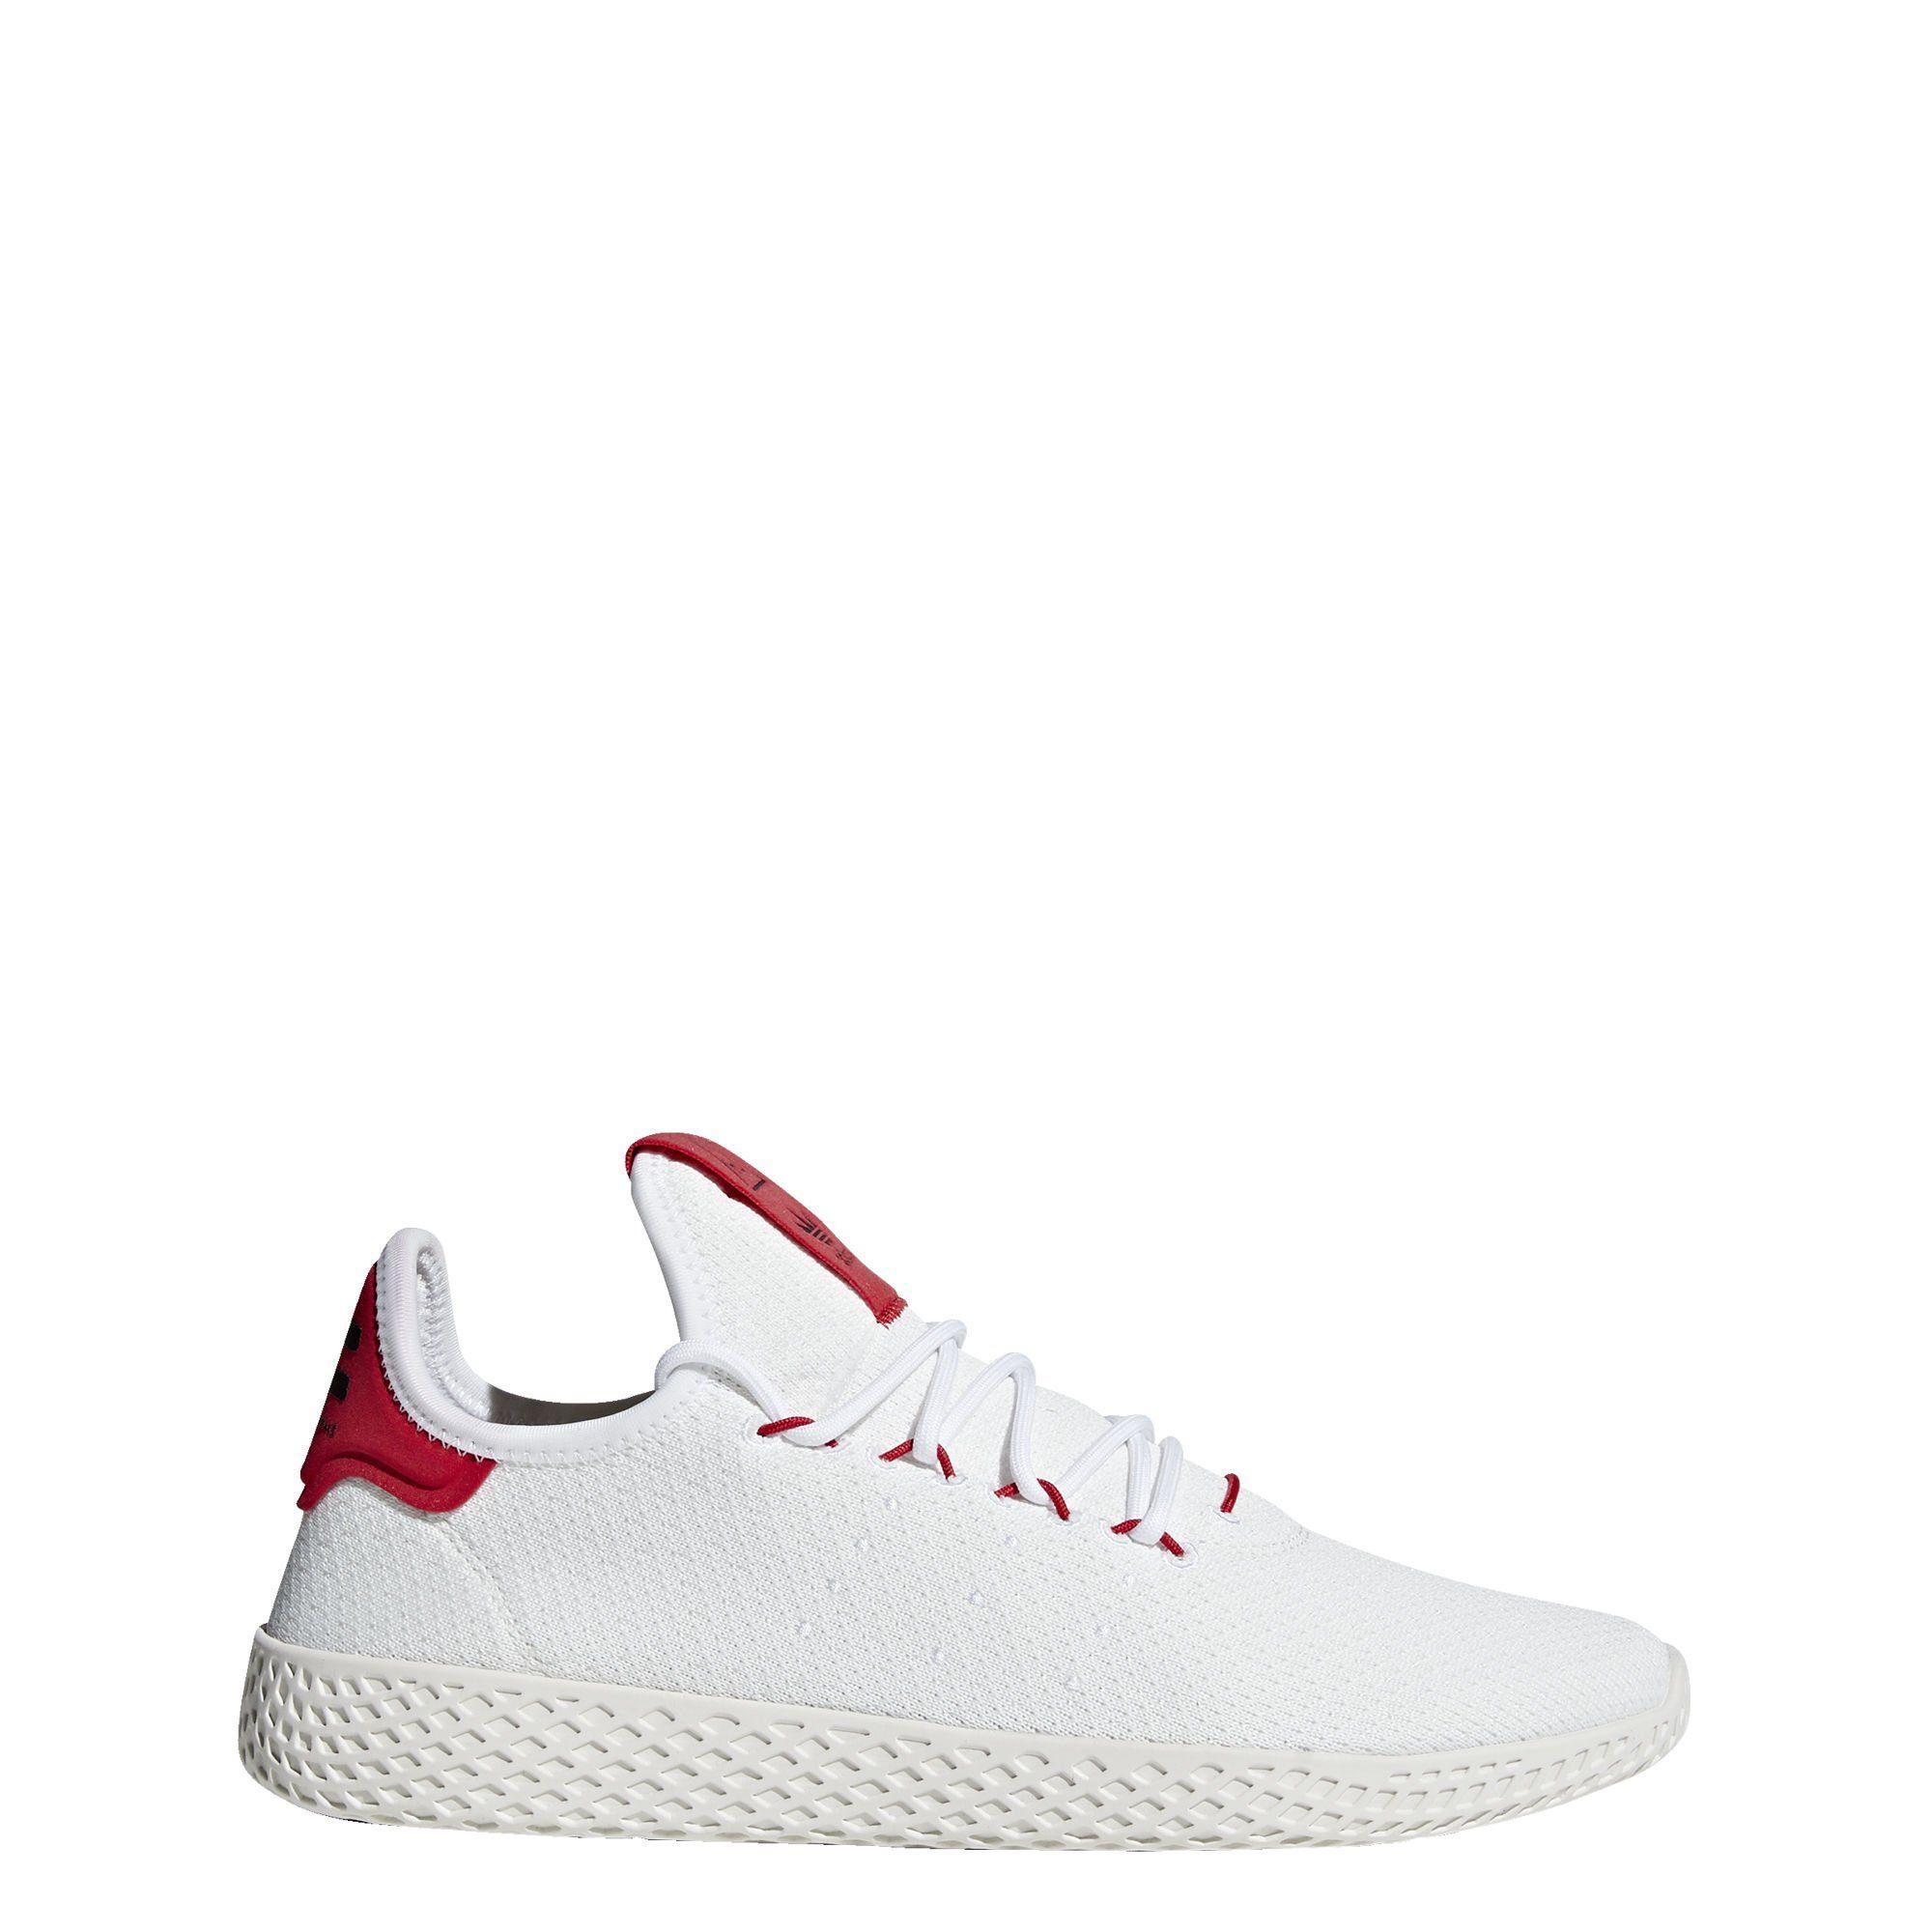 adidas Originals »Pharrell Williams Tennis HU Schuh« Sneaker Pharrell online kaufen | OTTO